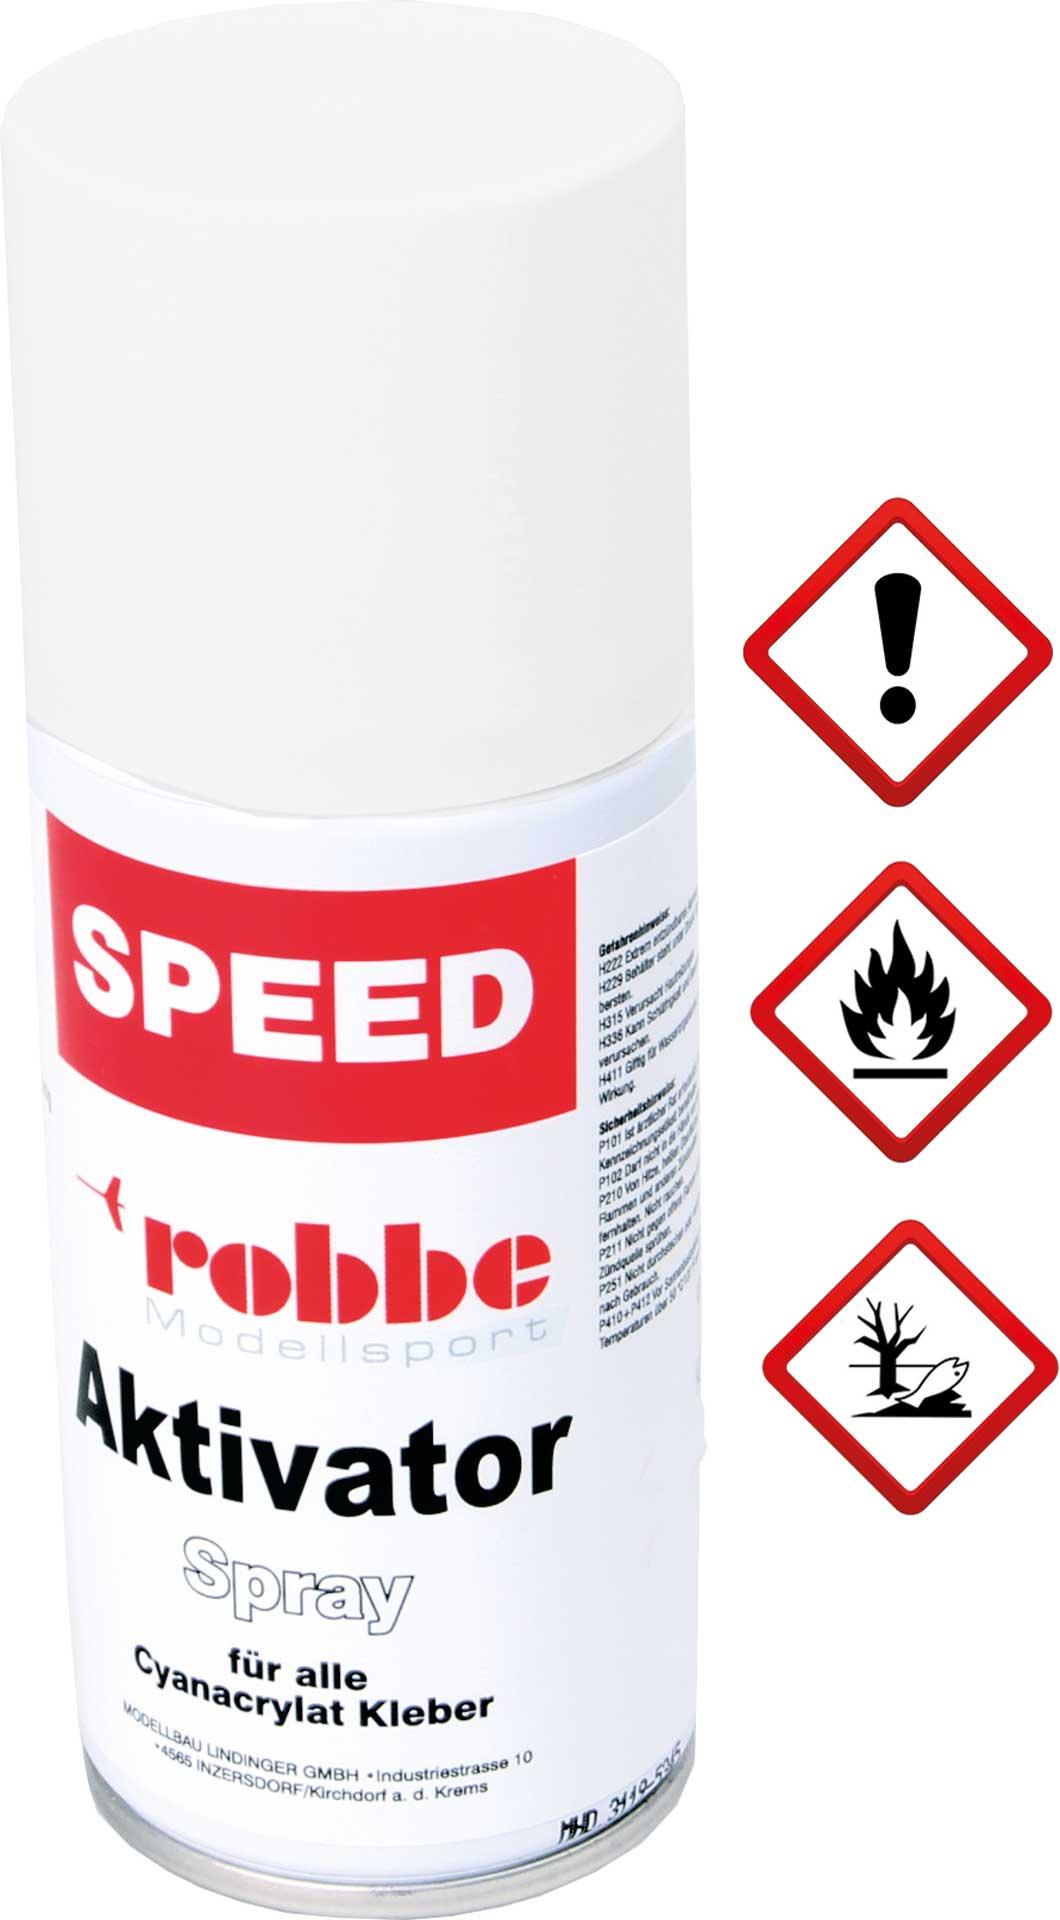 Robbe Modellsport AKTIVATOR-SPRAY SPEED 150ML